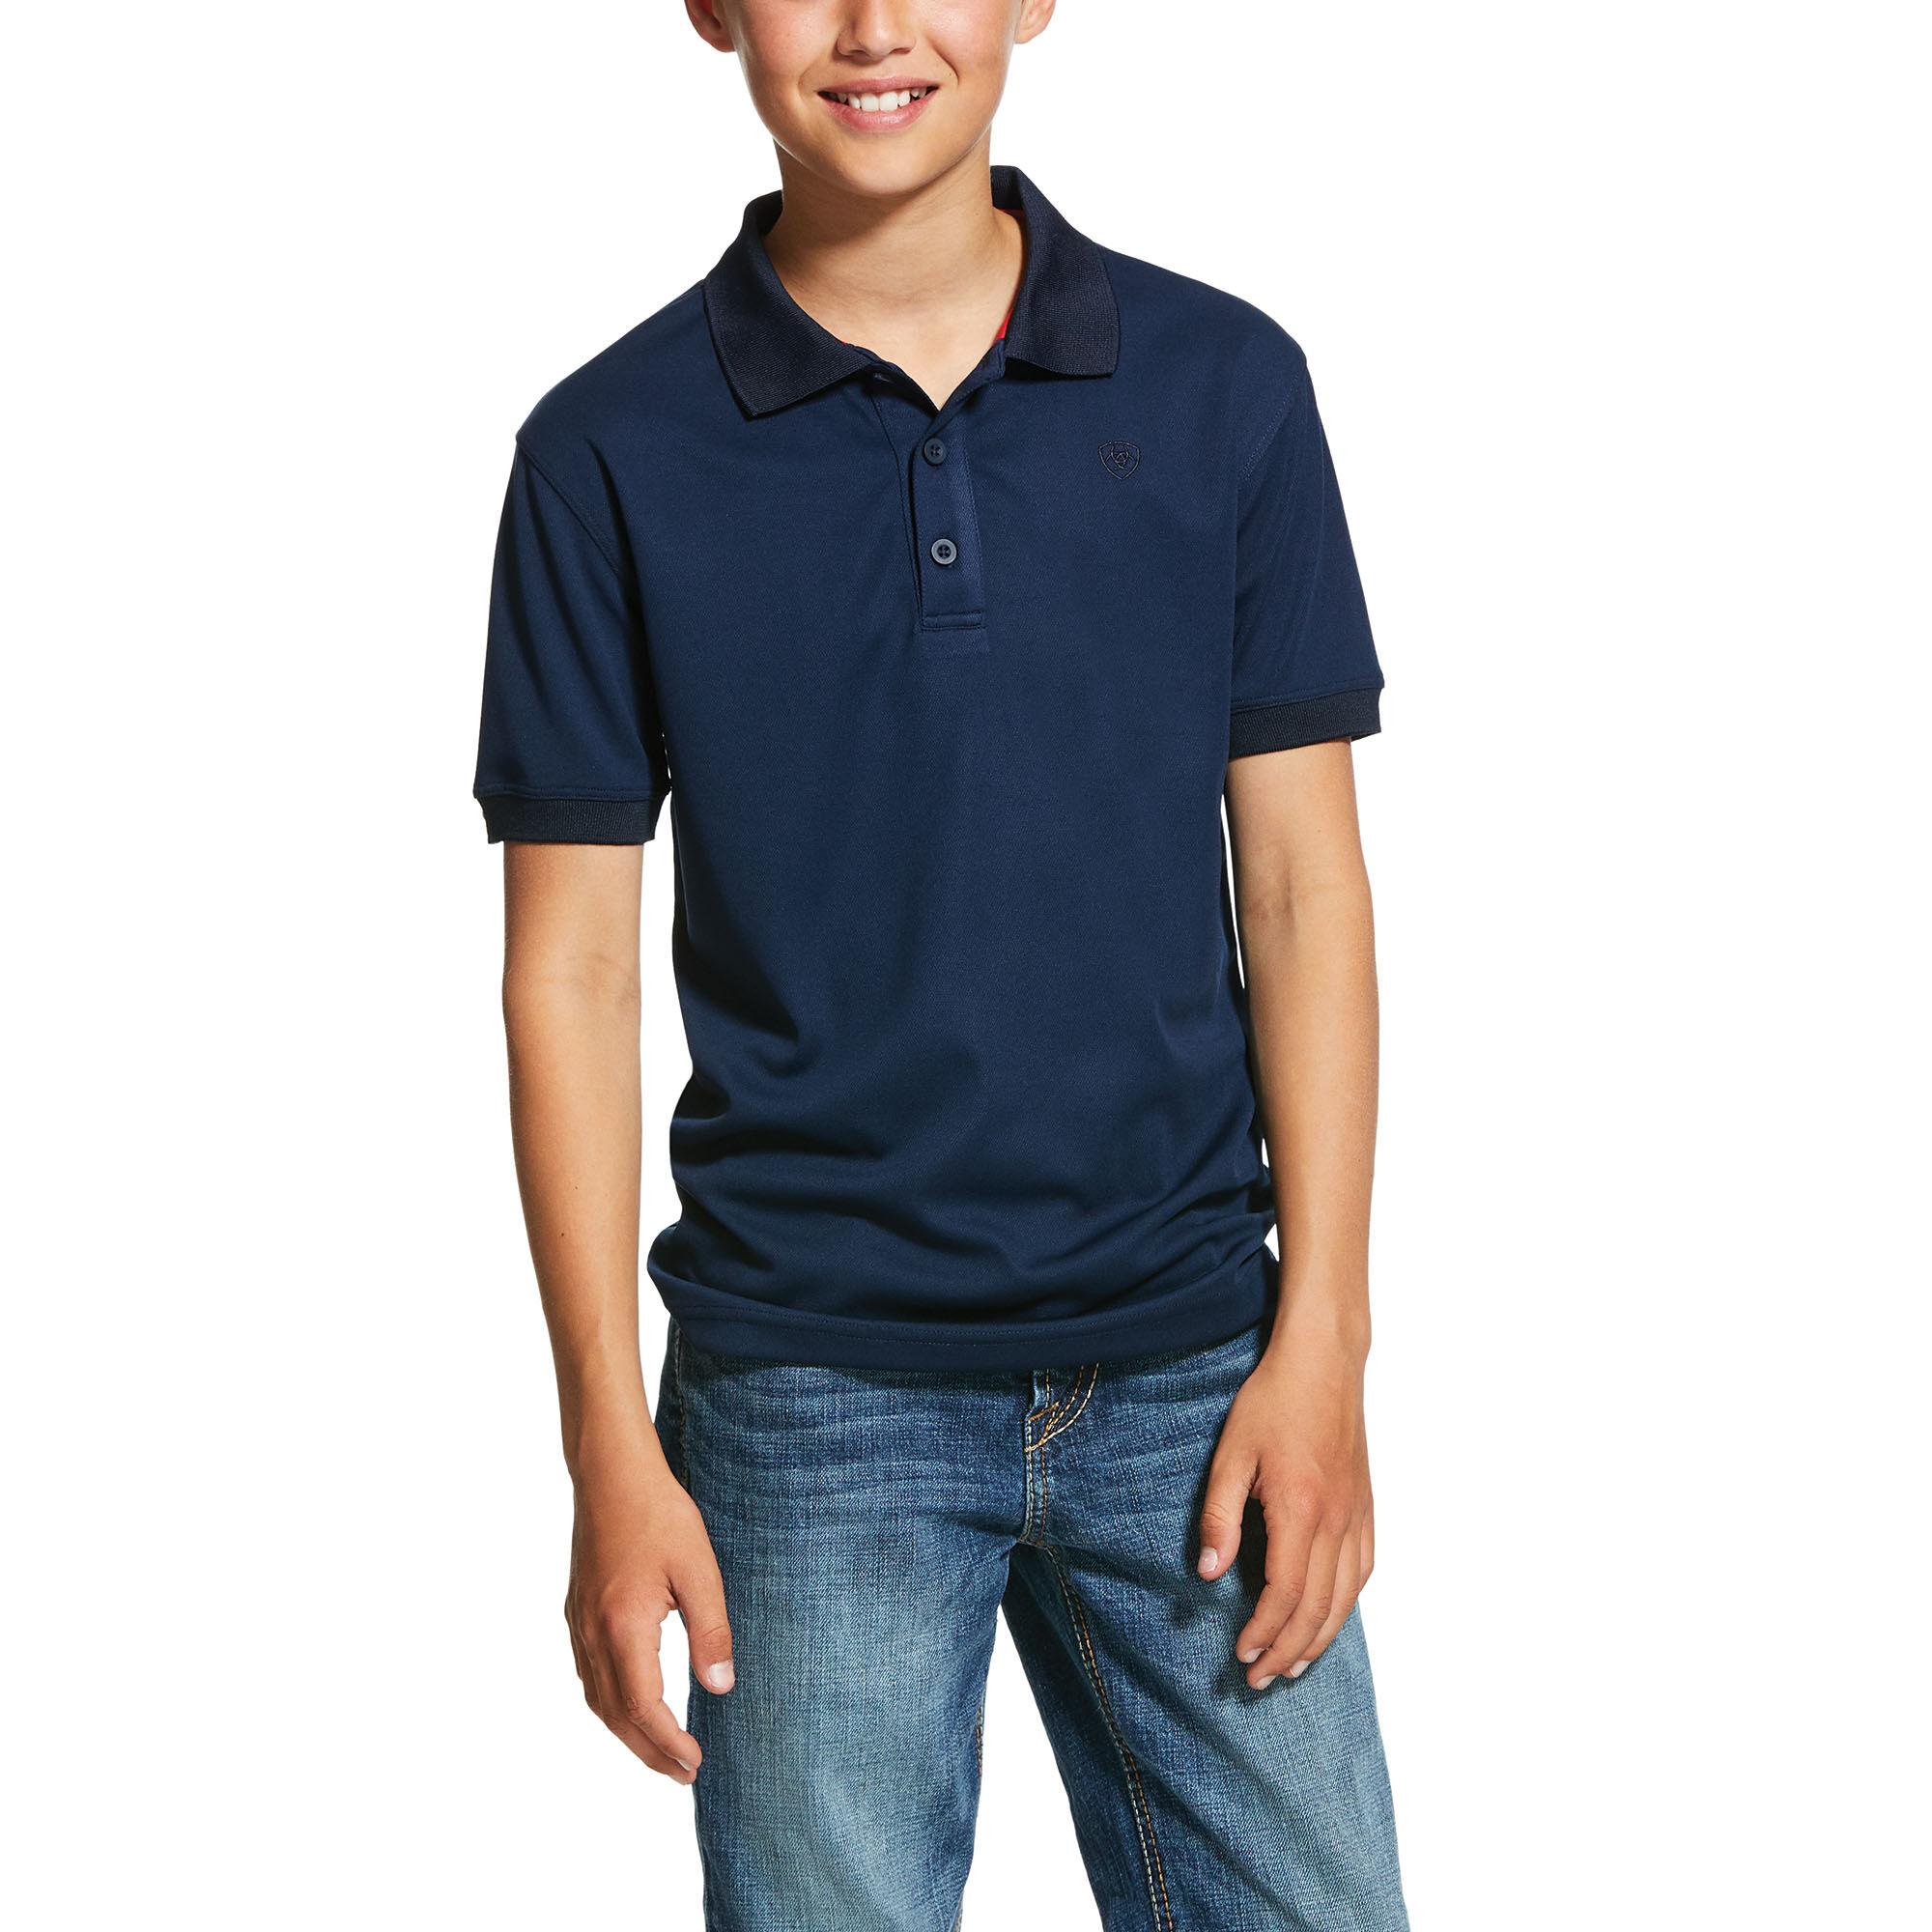 Sea Horse Apparel Boys White Half Sleeve Polo Shirt